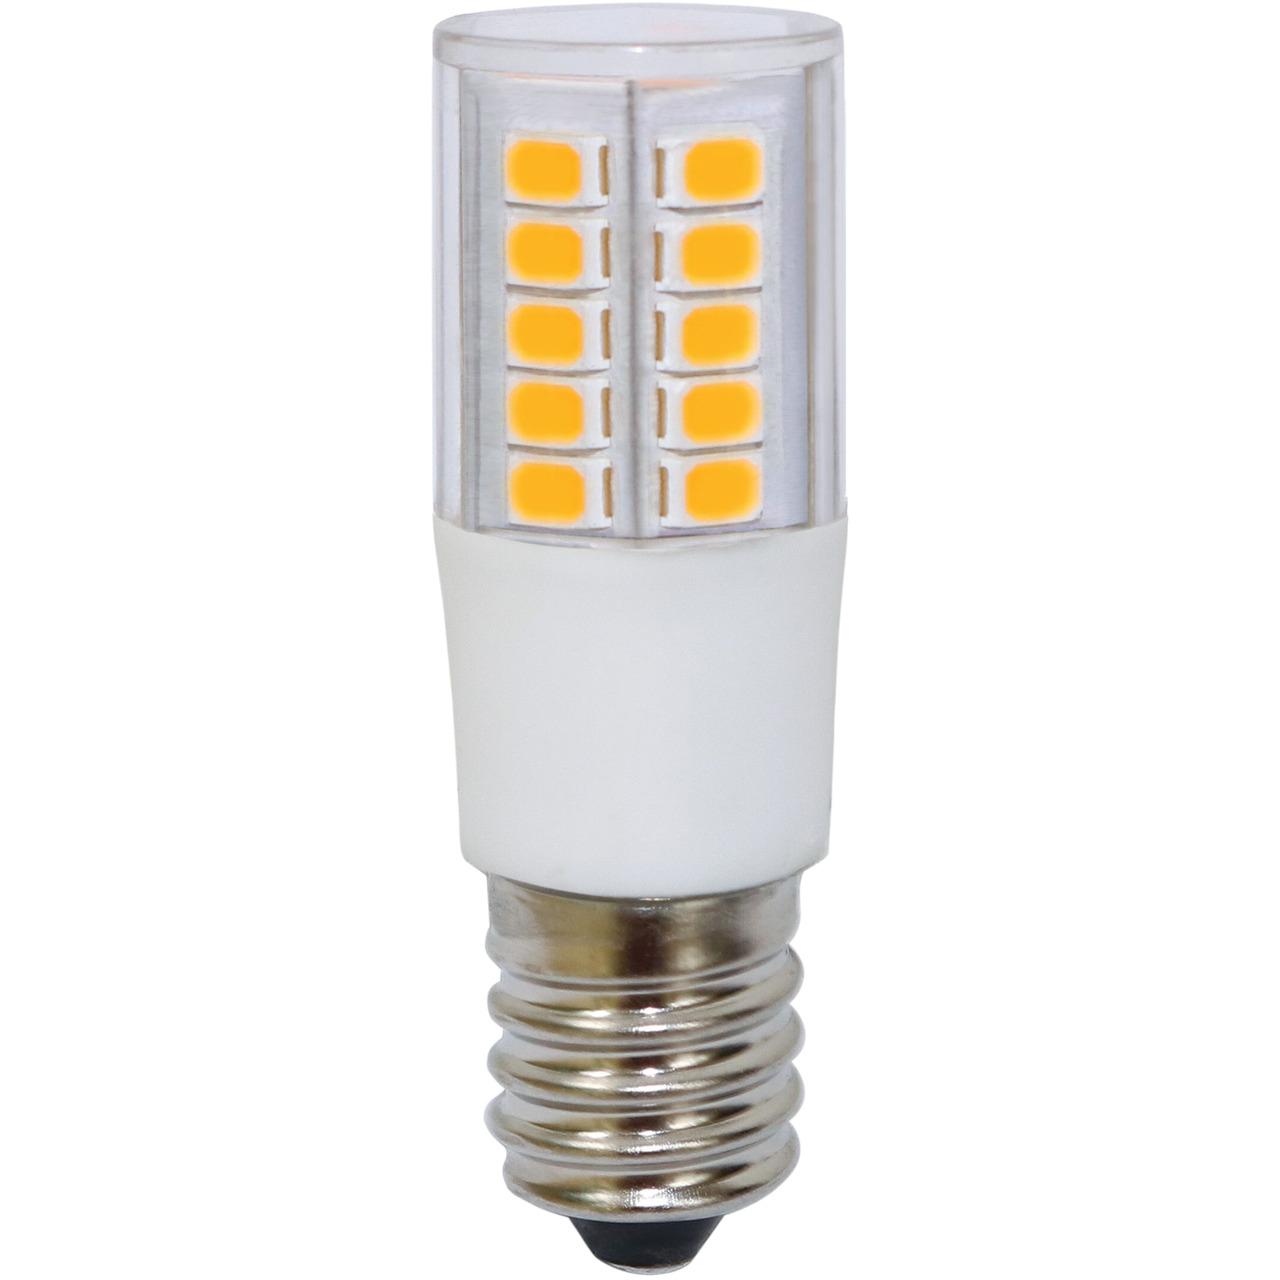 LIGHTME 5-5-W-T20-LED-Kolbenlampe E14- warmweiss